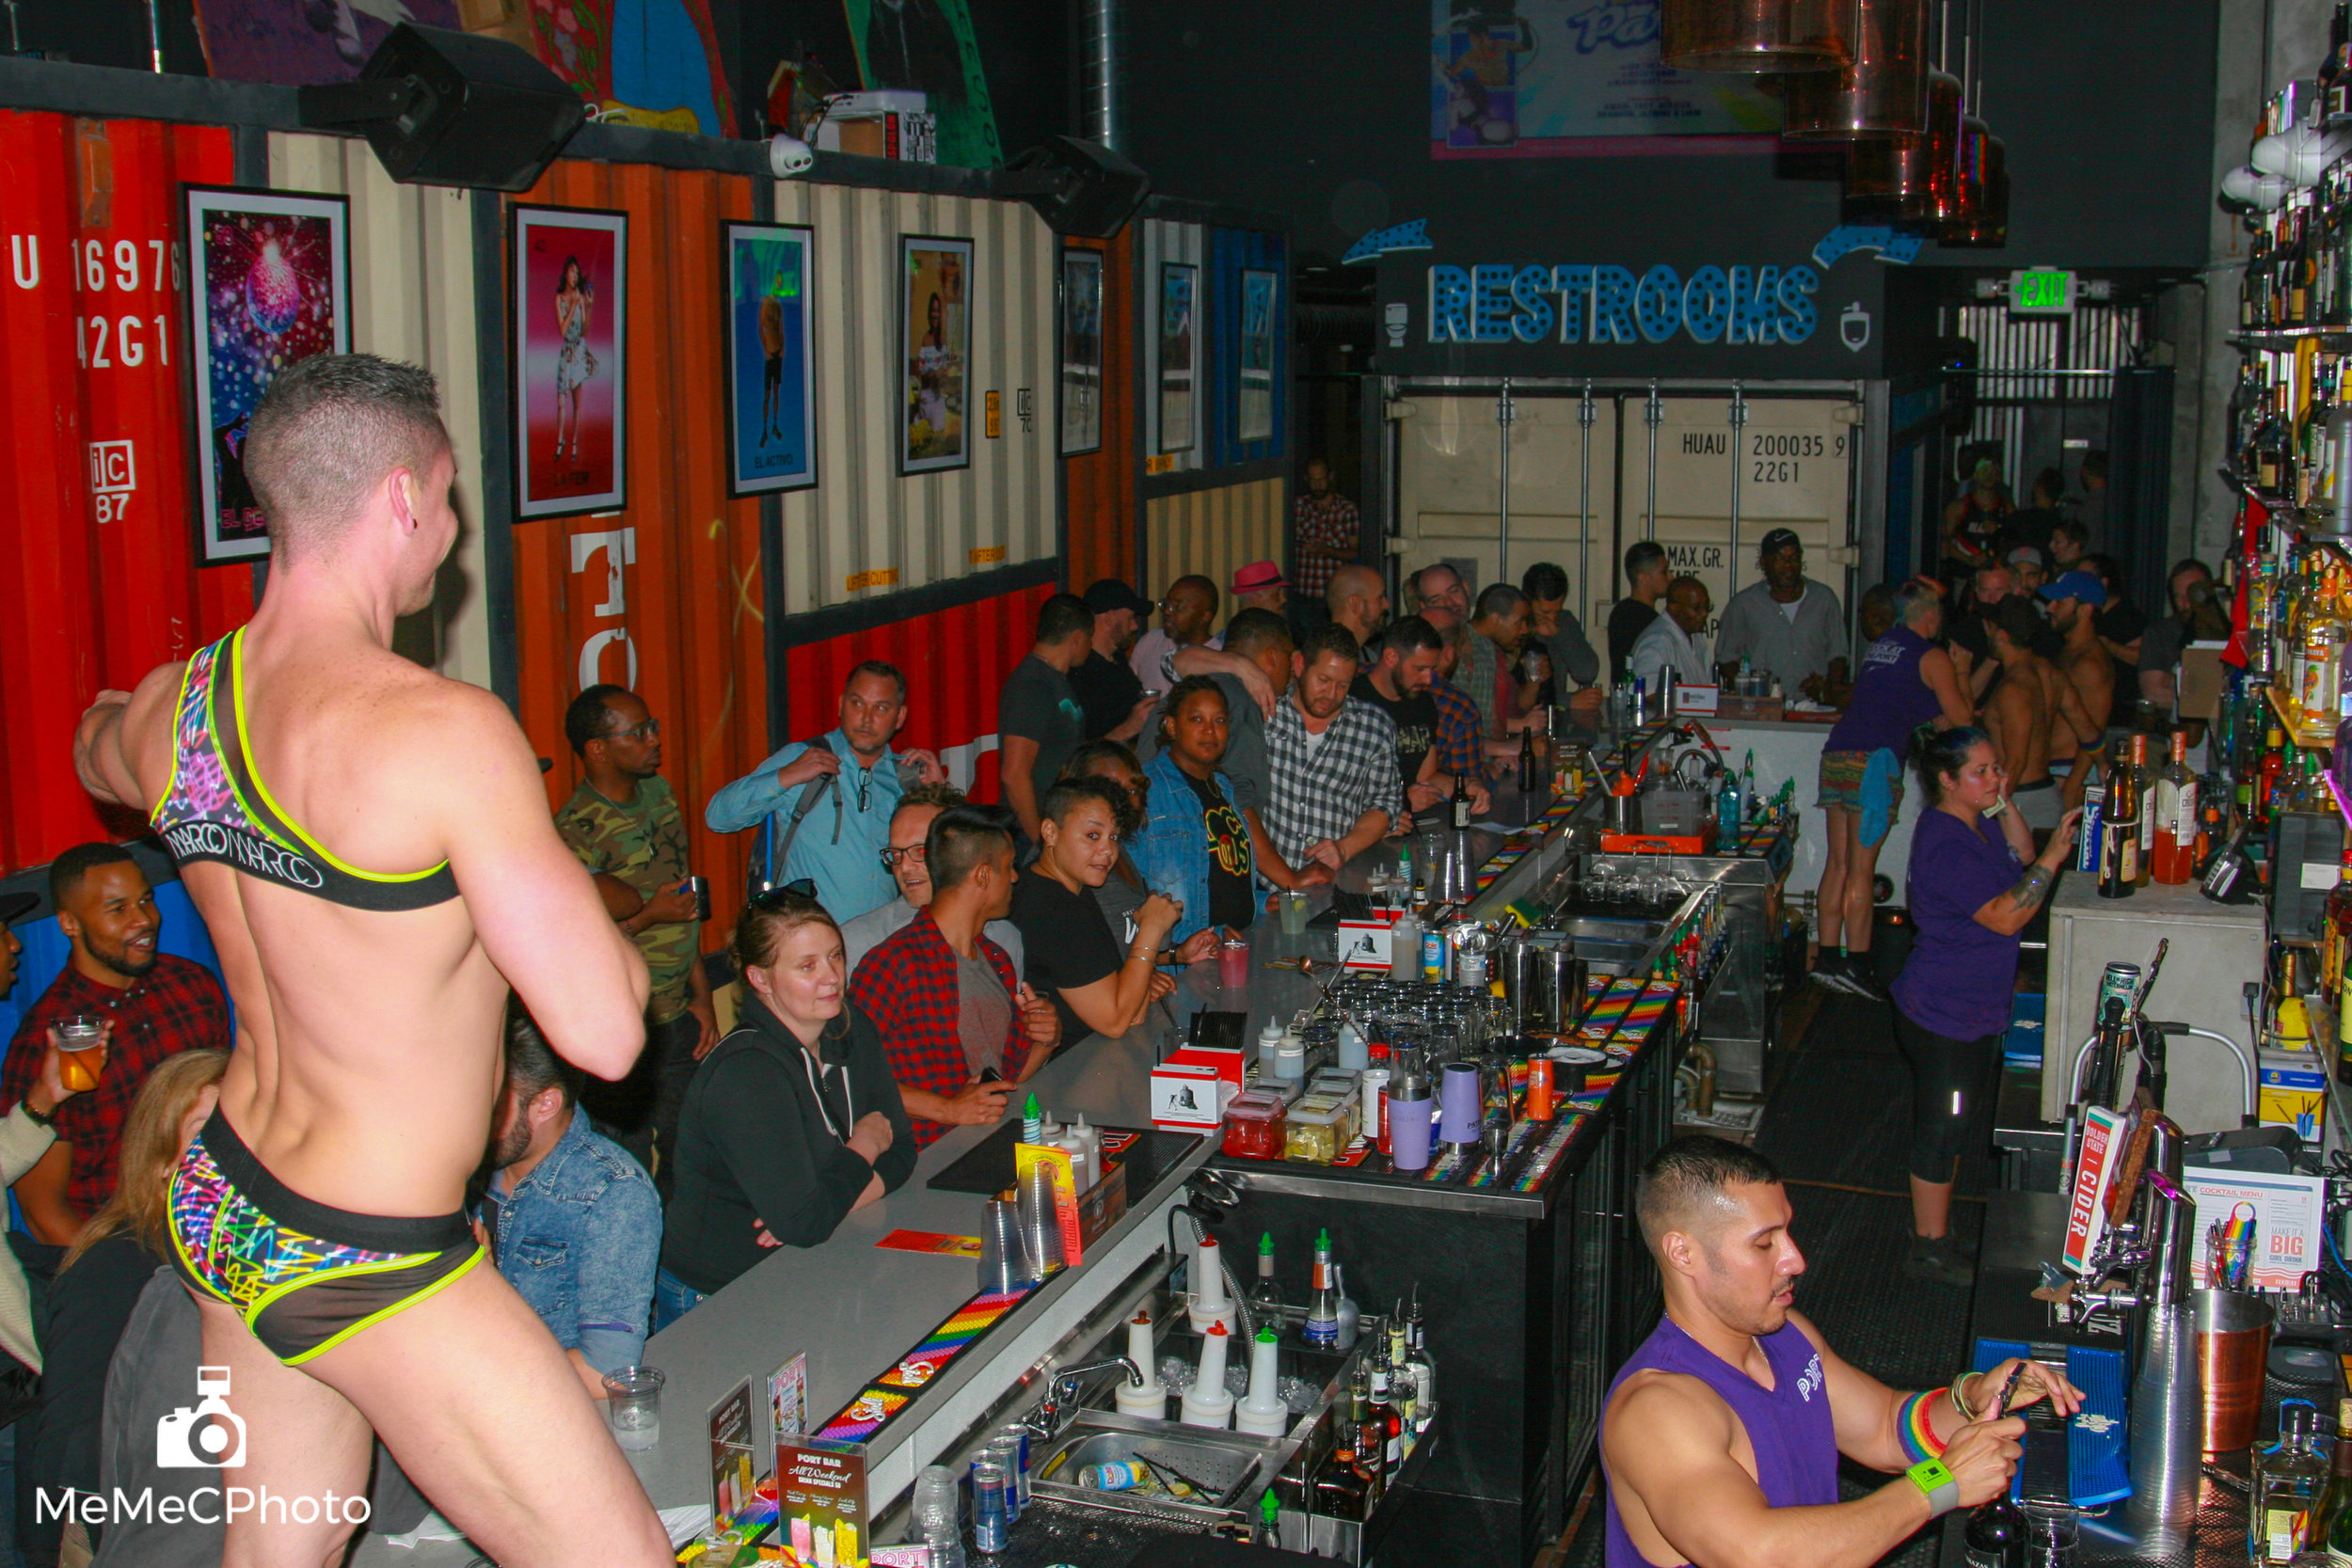 Port Bar Oakland Pride - 33-33.jpg